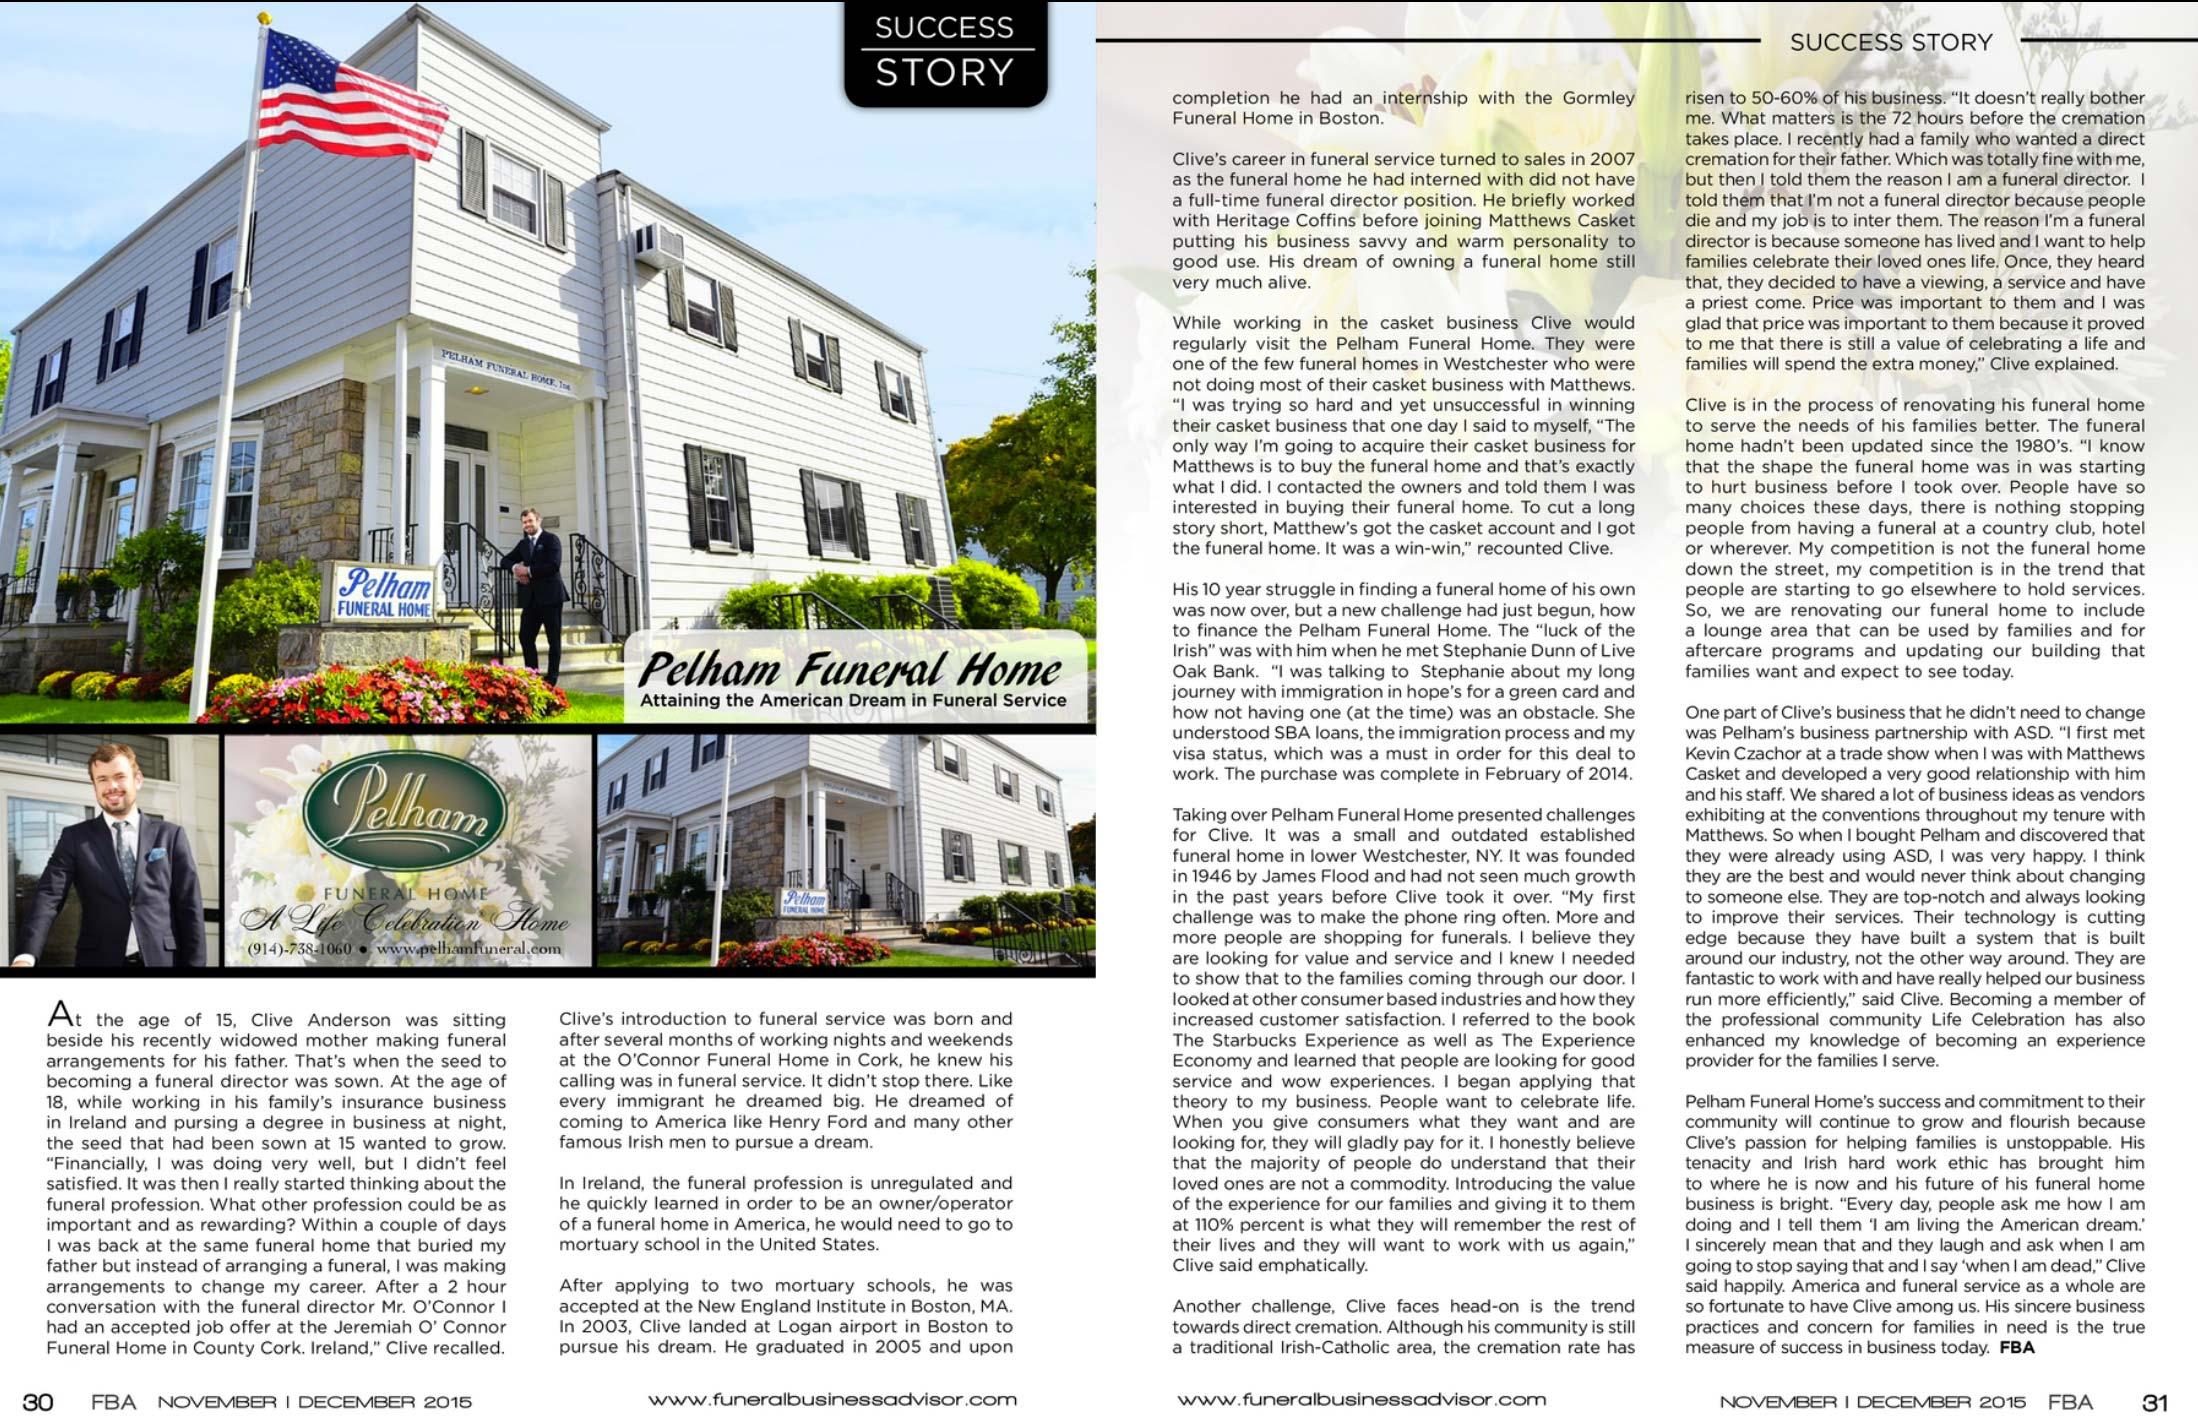 Read About Pelham's Success Story